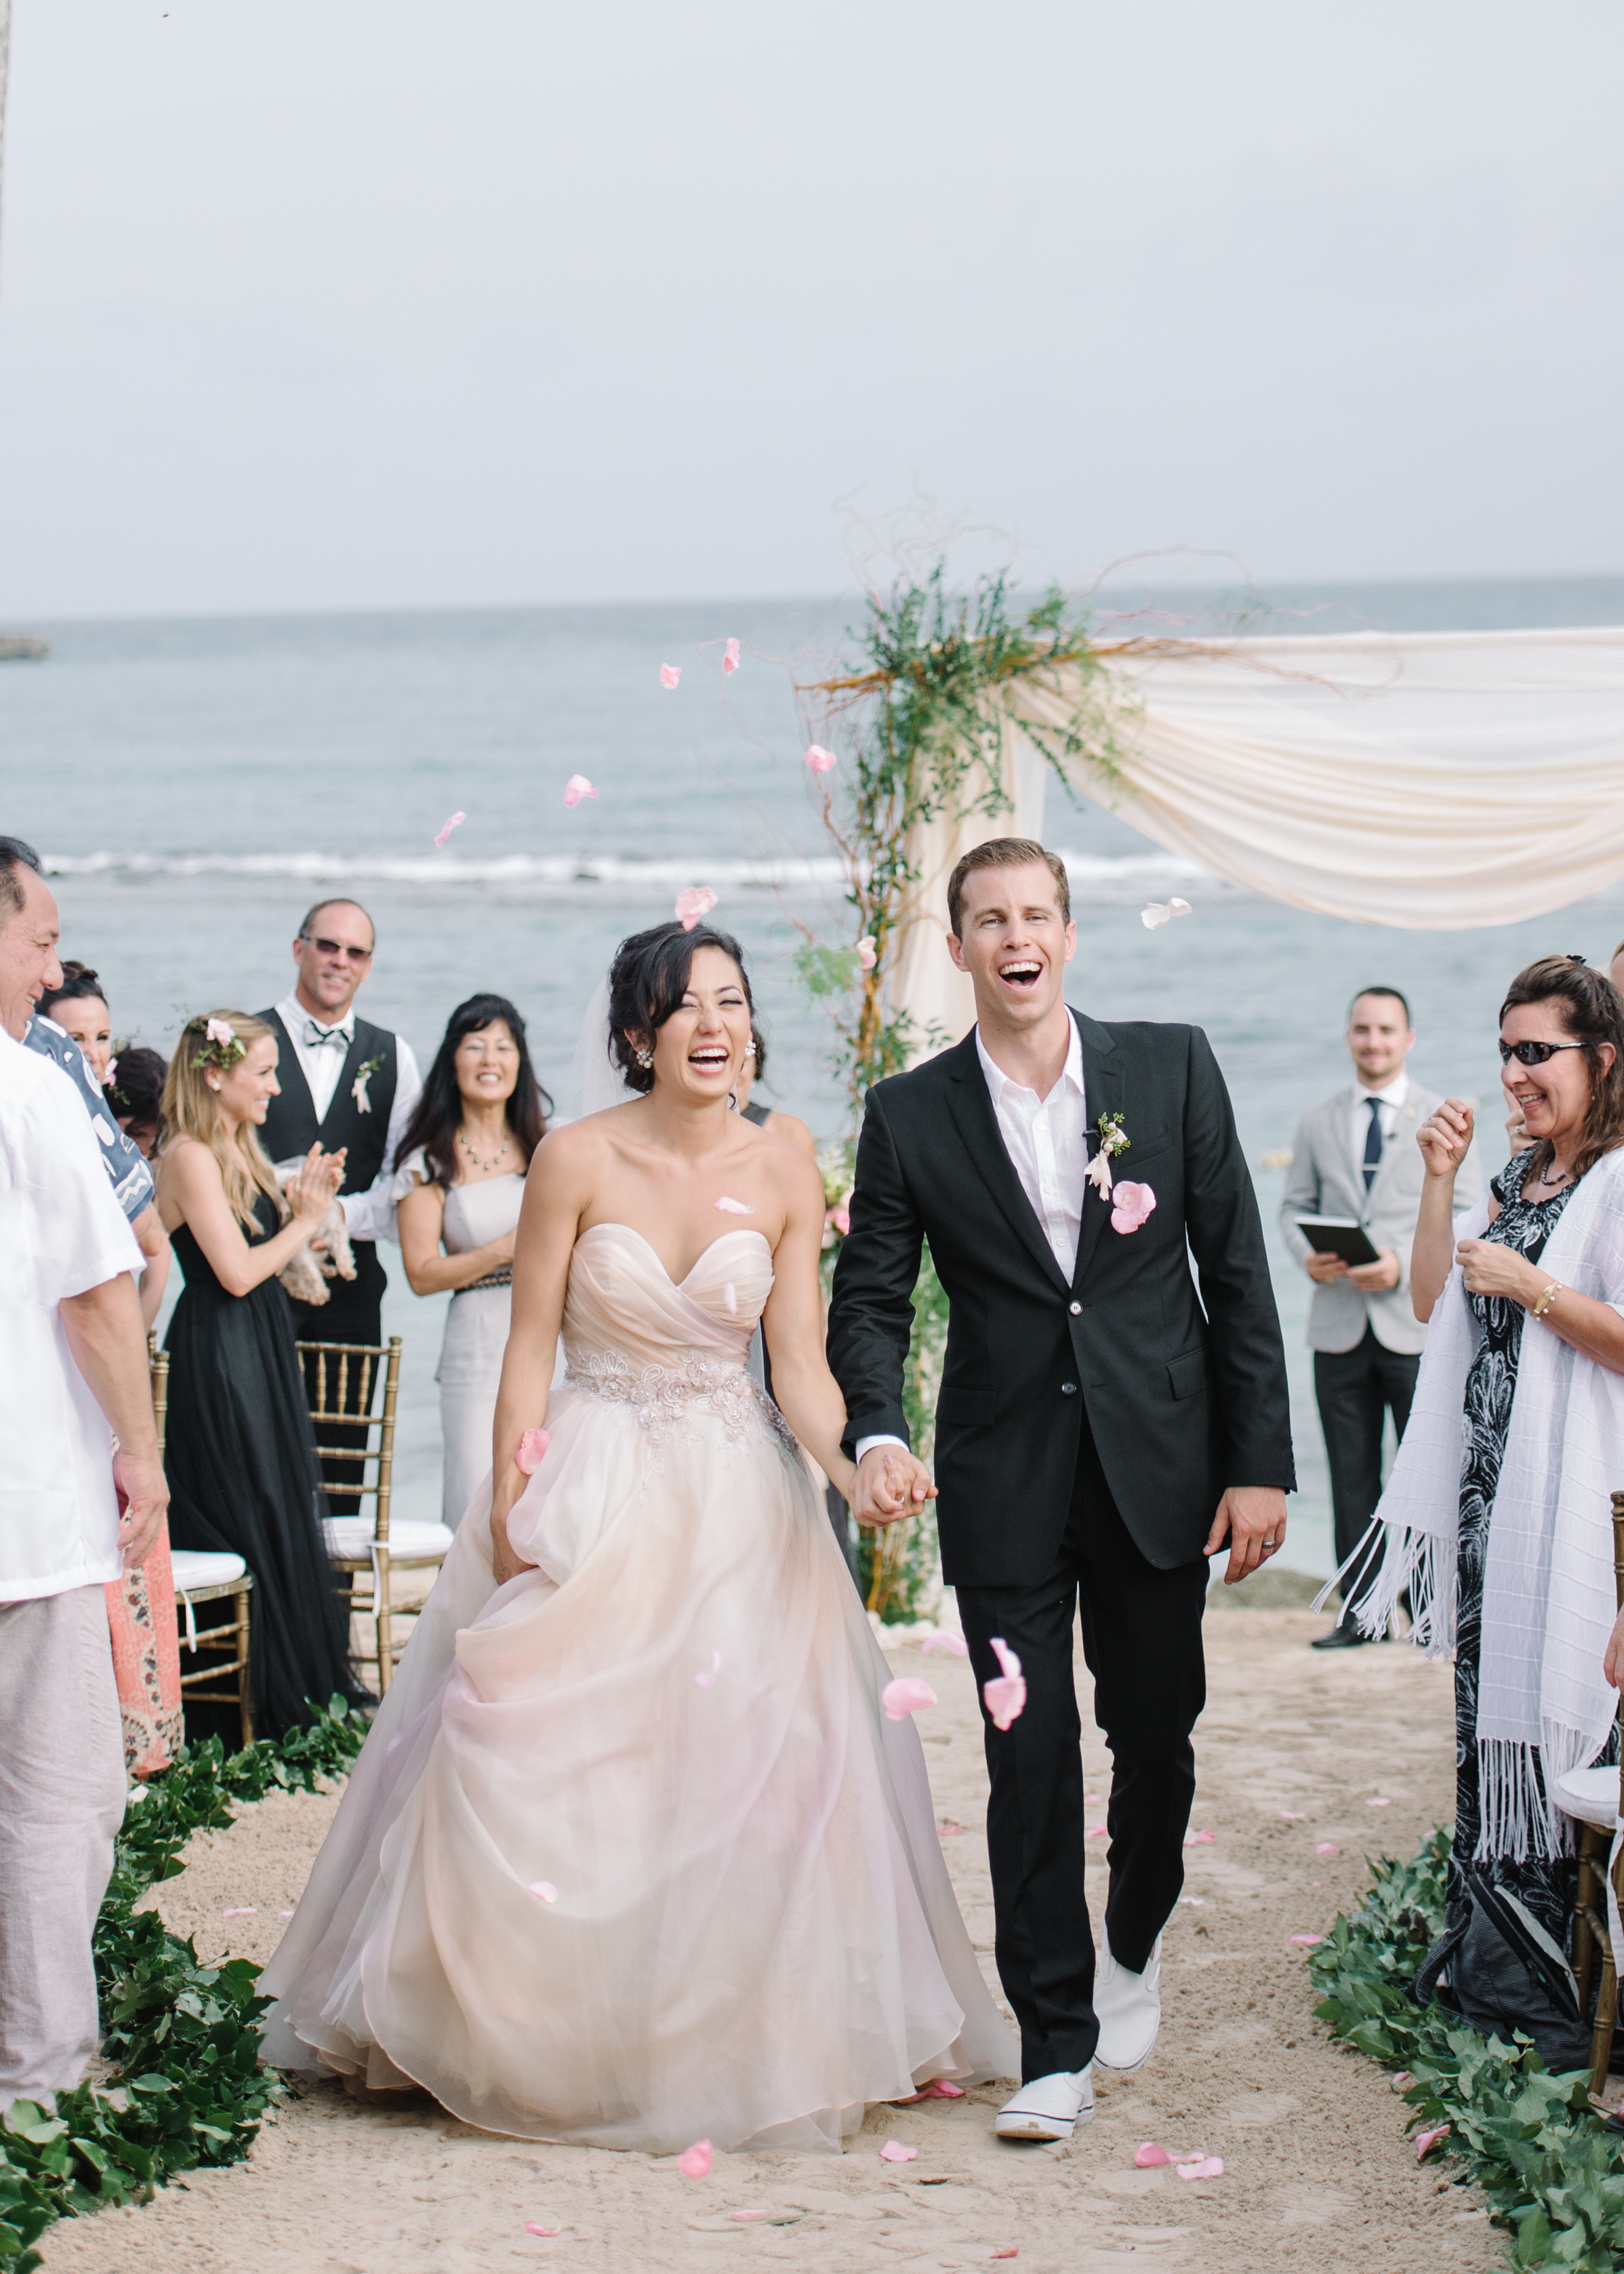 Ashleigh and Brian-Wedding Day-Carrie King Photographer-374.jpg